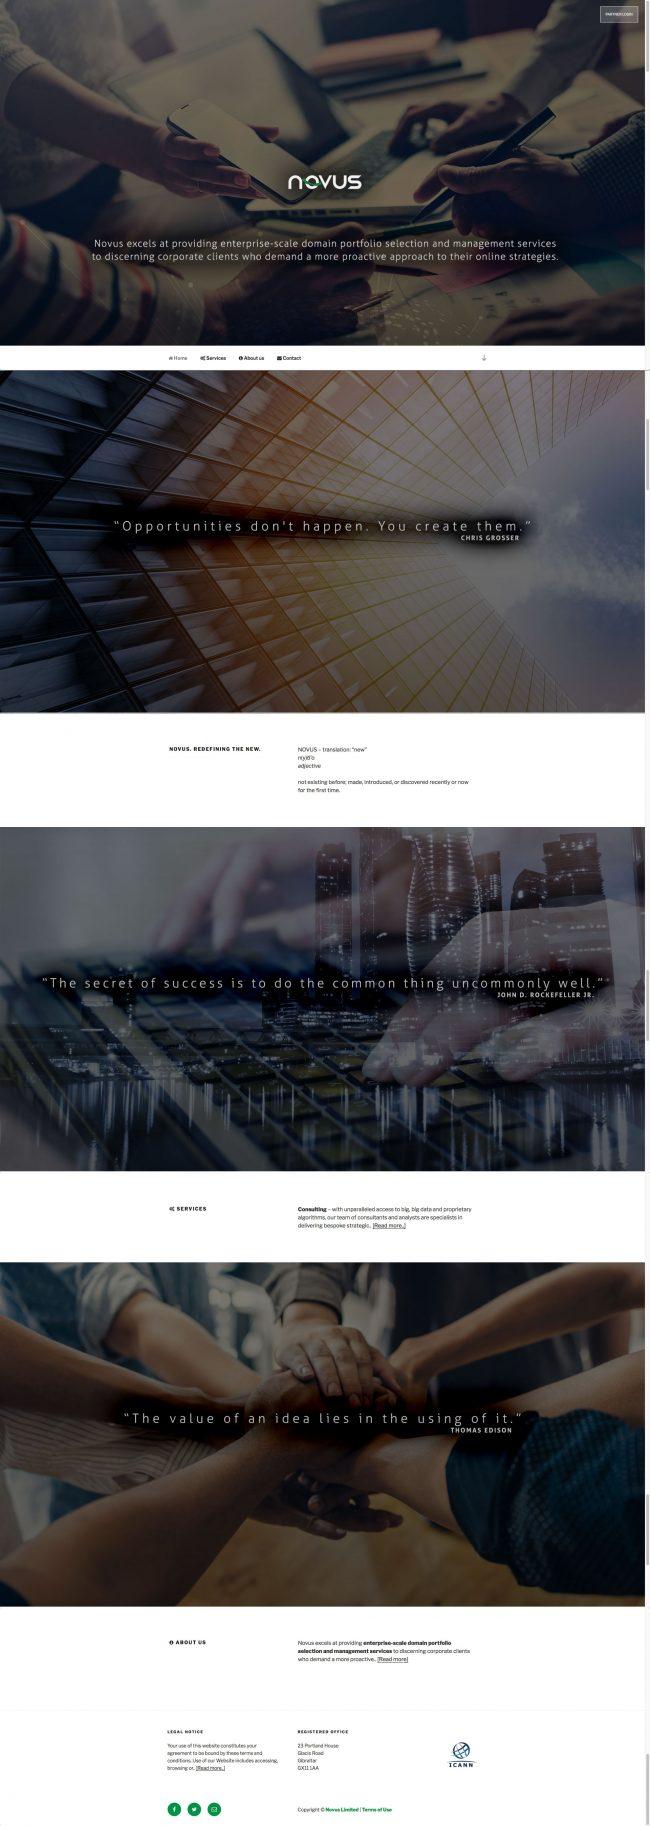 Novus Domains website concept and design (Wordpress platform)